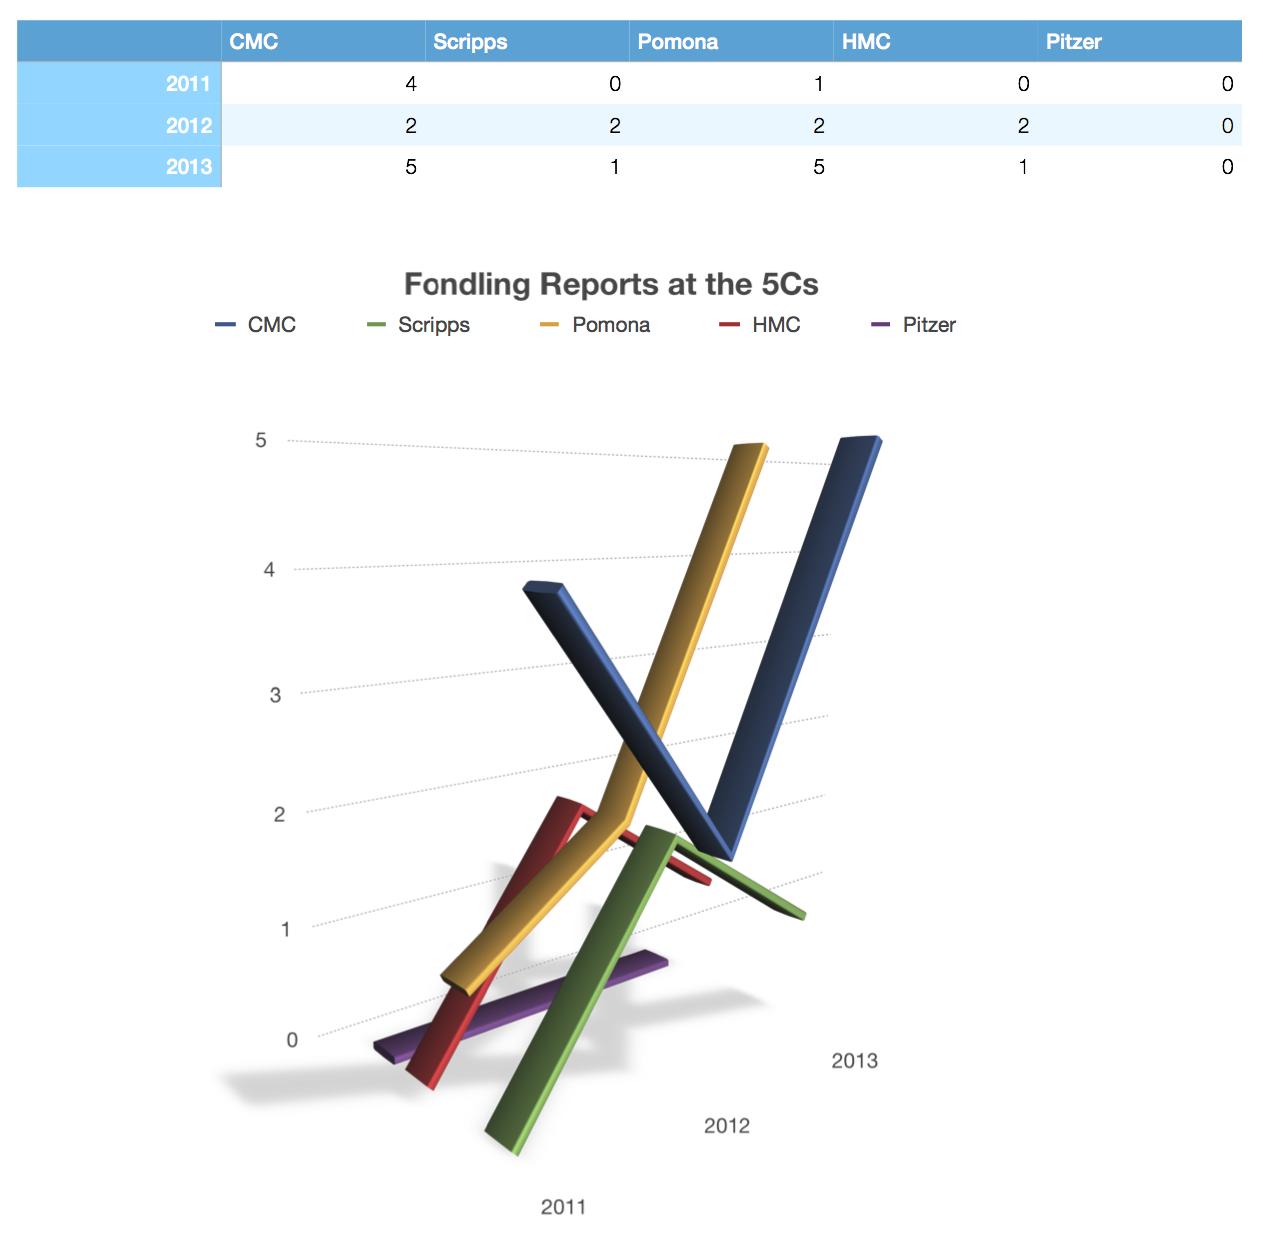 Fondling reports at 5Cs